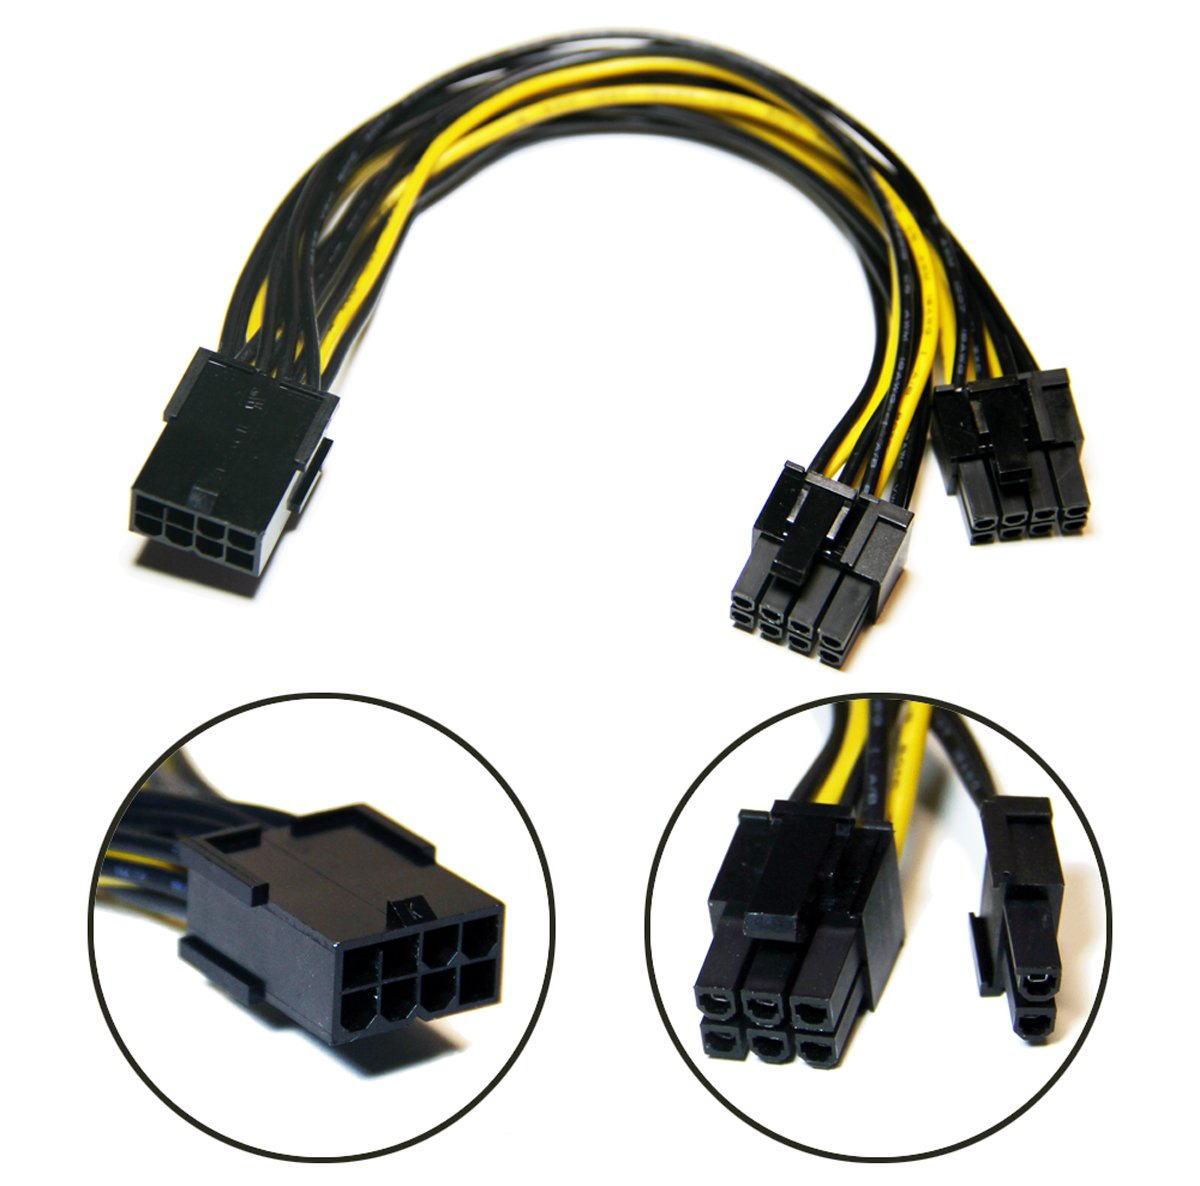 8 Pin PCI-E PCI Express Graphics Video Card GPU VGA 8 Pin Female to Dual GPU 8Pin (6+2) Pin Male GPU 8 pin Splitter Power Extension Cable 8 Pin GPU molex (9-inch) 3 Pack +Bonus TeamProfitcom by TeamProfitcom (Image #2)